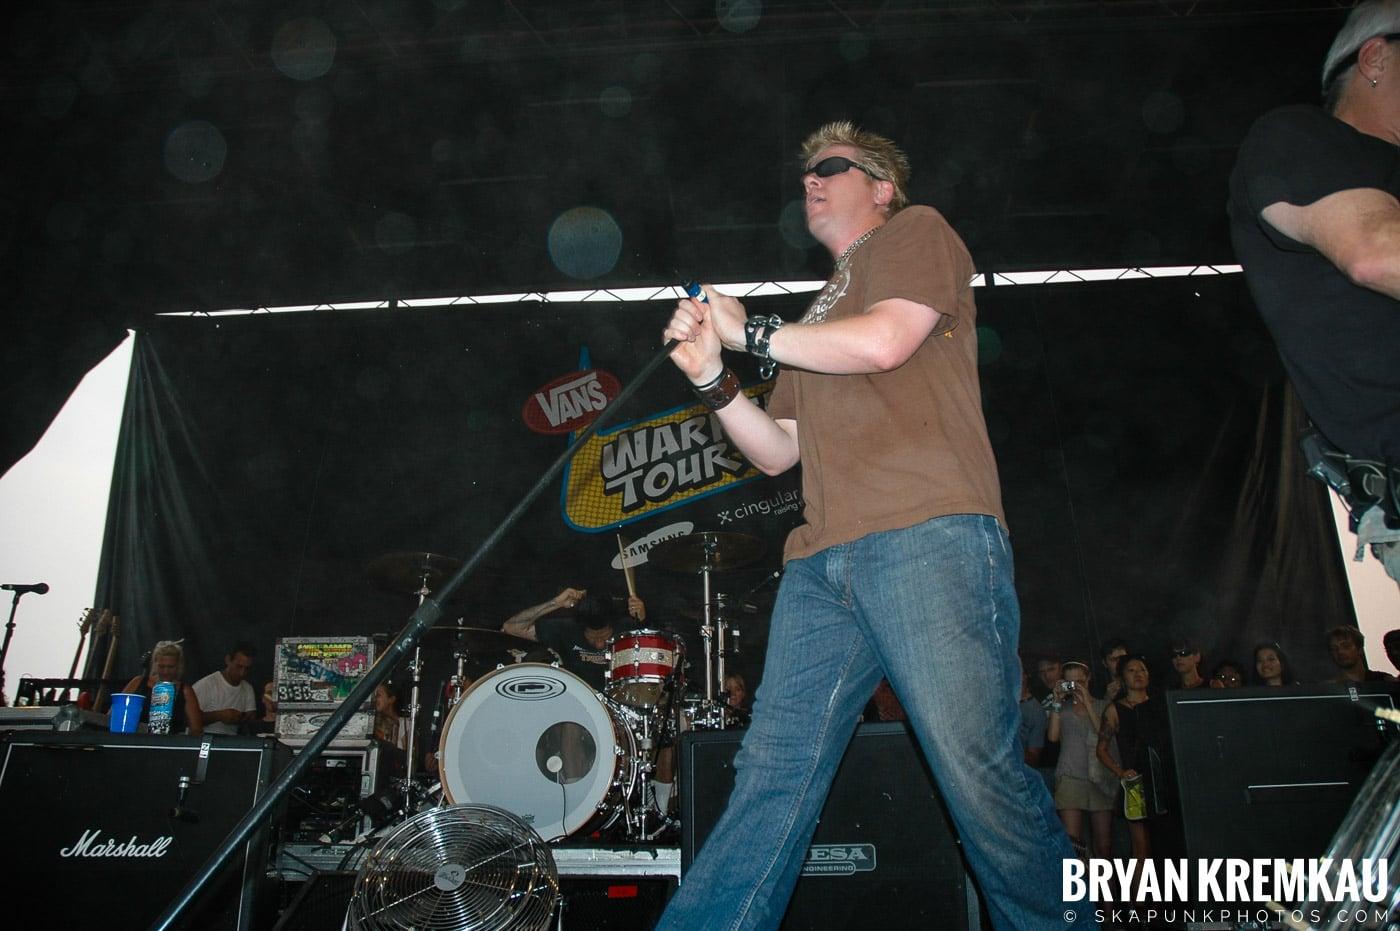 The Offspring @ Warped Tour 05, NYC - 8.12.05 (15)